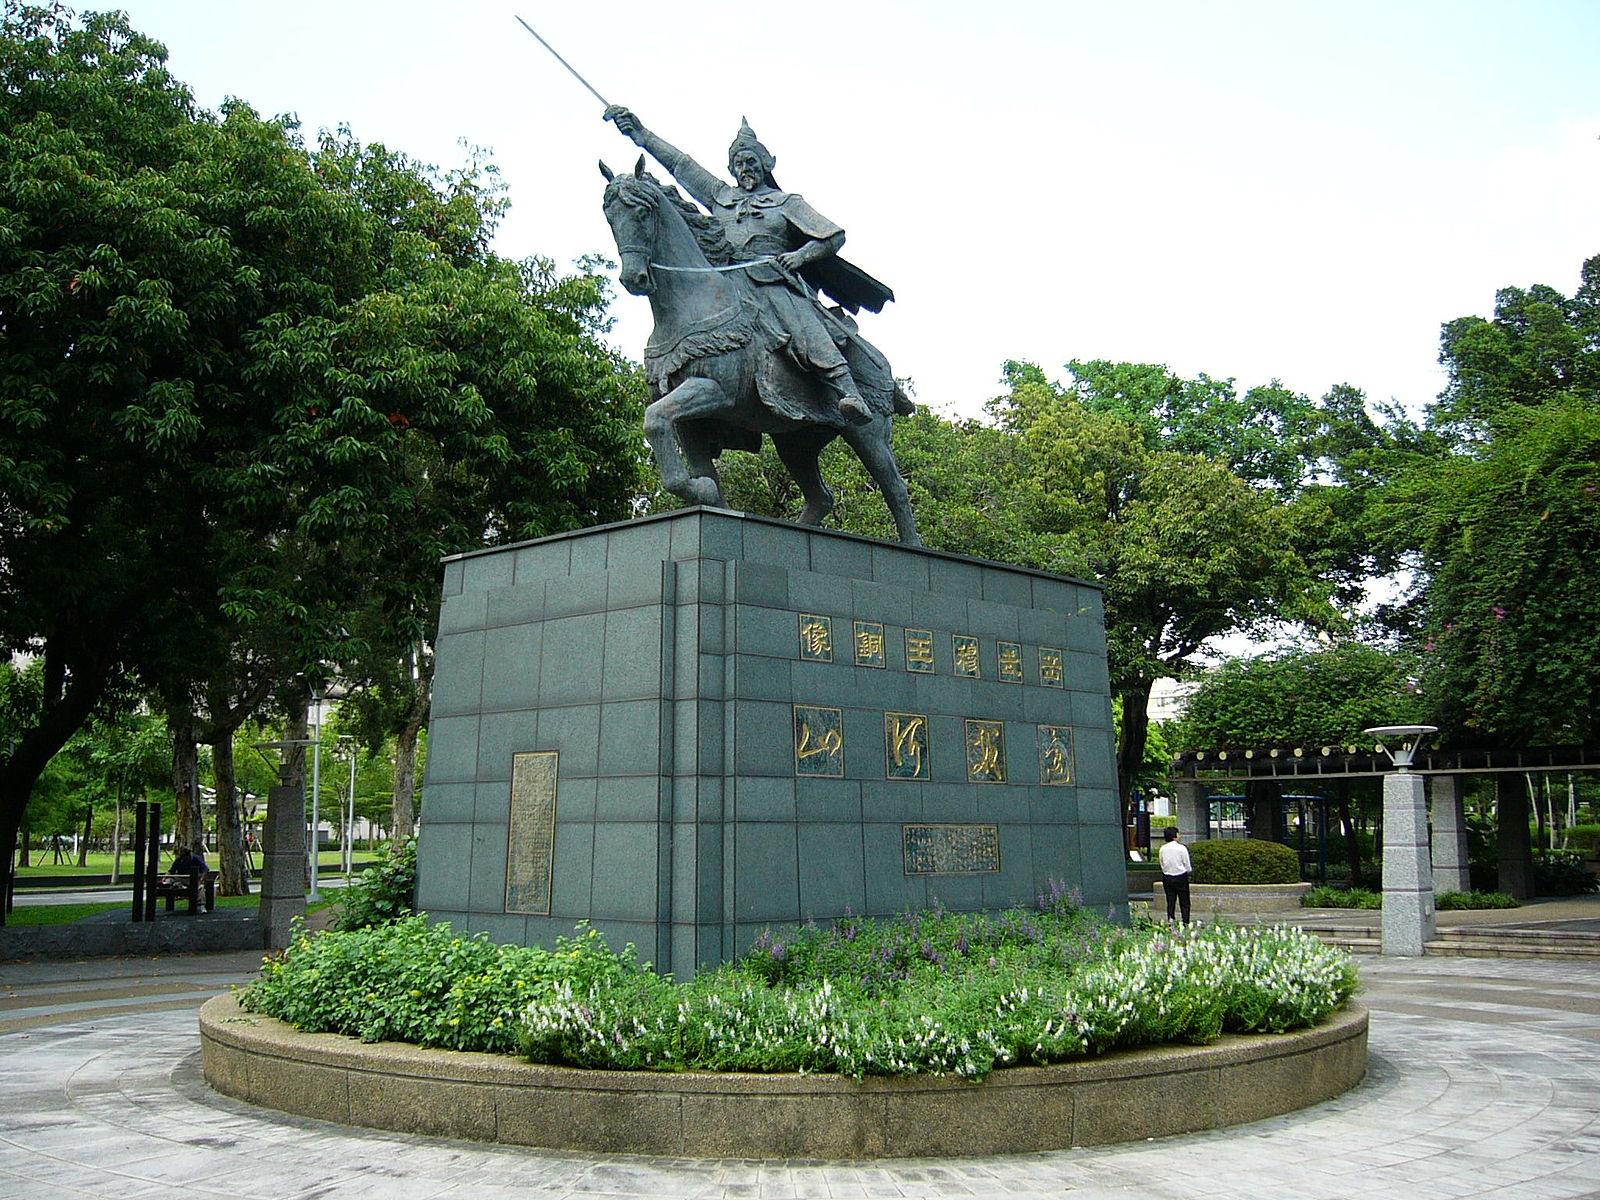 A copper statue of Yue Fei in Lin Sen Park, Taipei, Taiwan. (Image: Solomon203 via Wikimedia CC BY-SA 3.0)